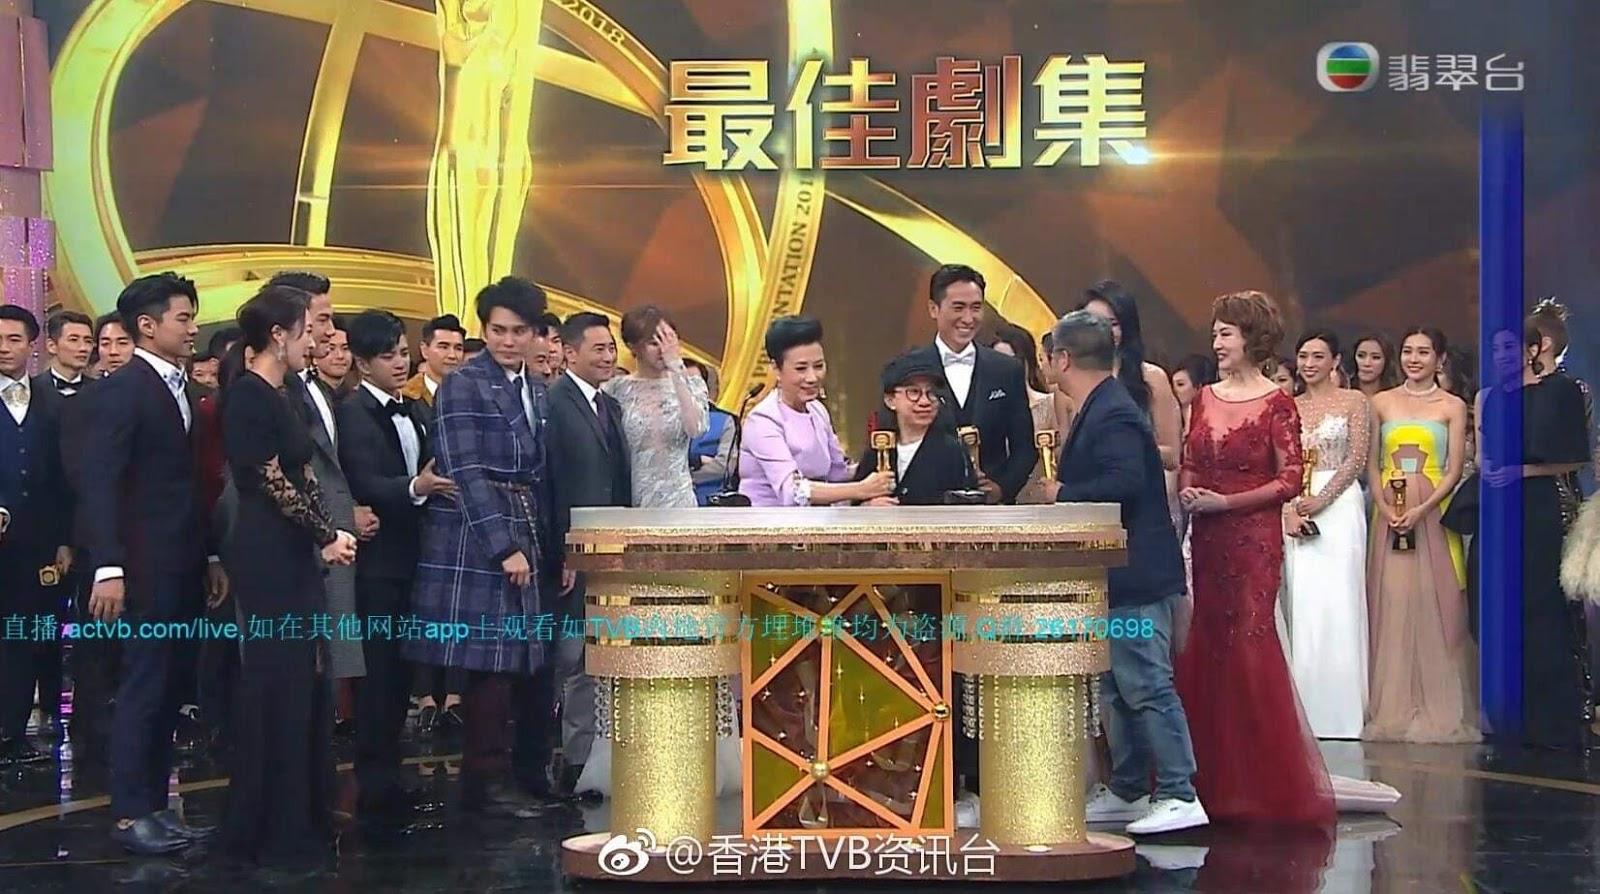 TVB Anniversary Awards 2018 Review